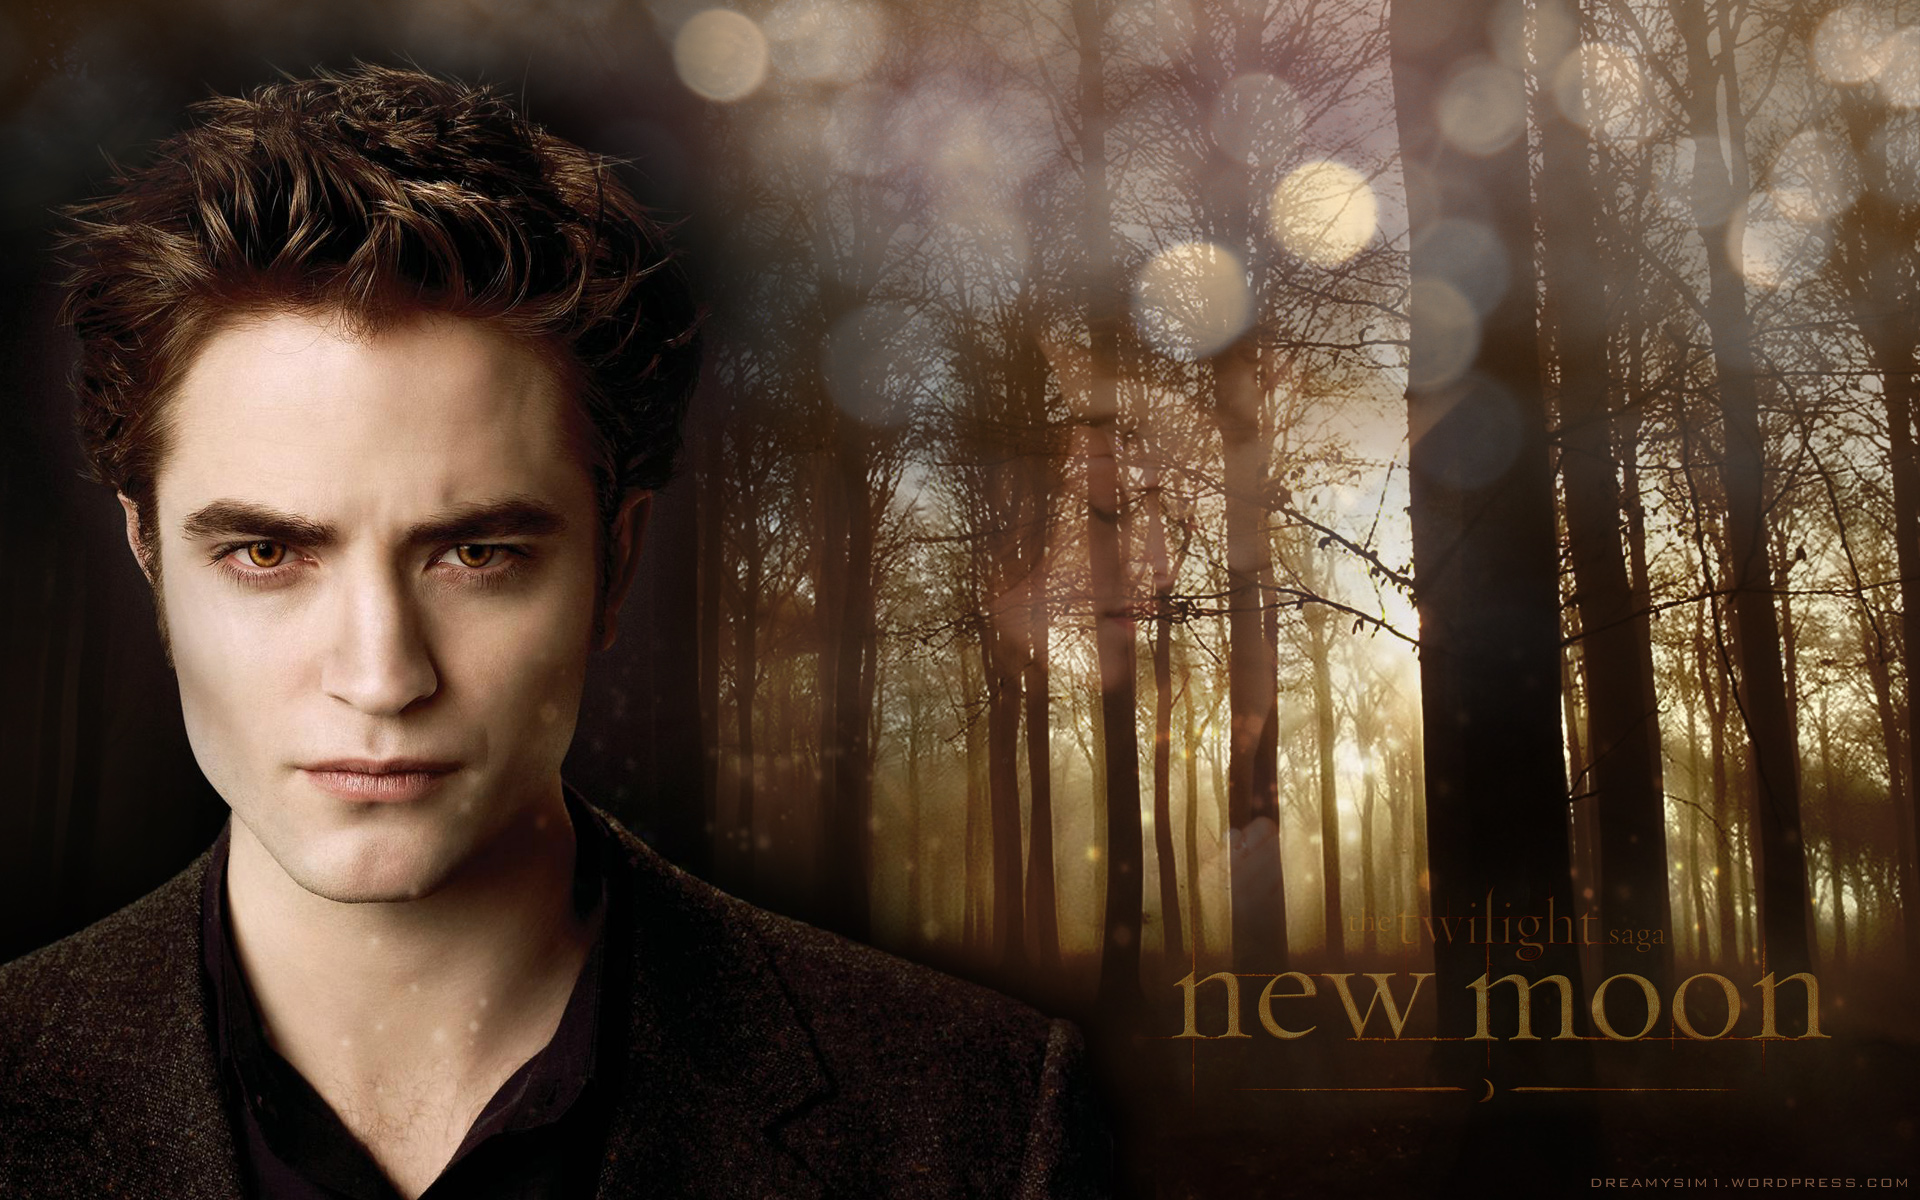 3 Gorgeous New Moon background with Robert Pattinson ... Robert Pattinson News